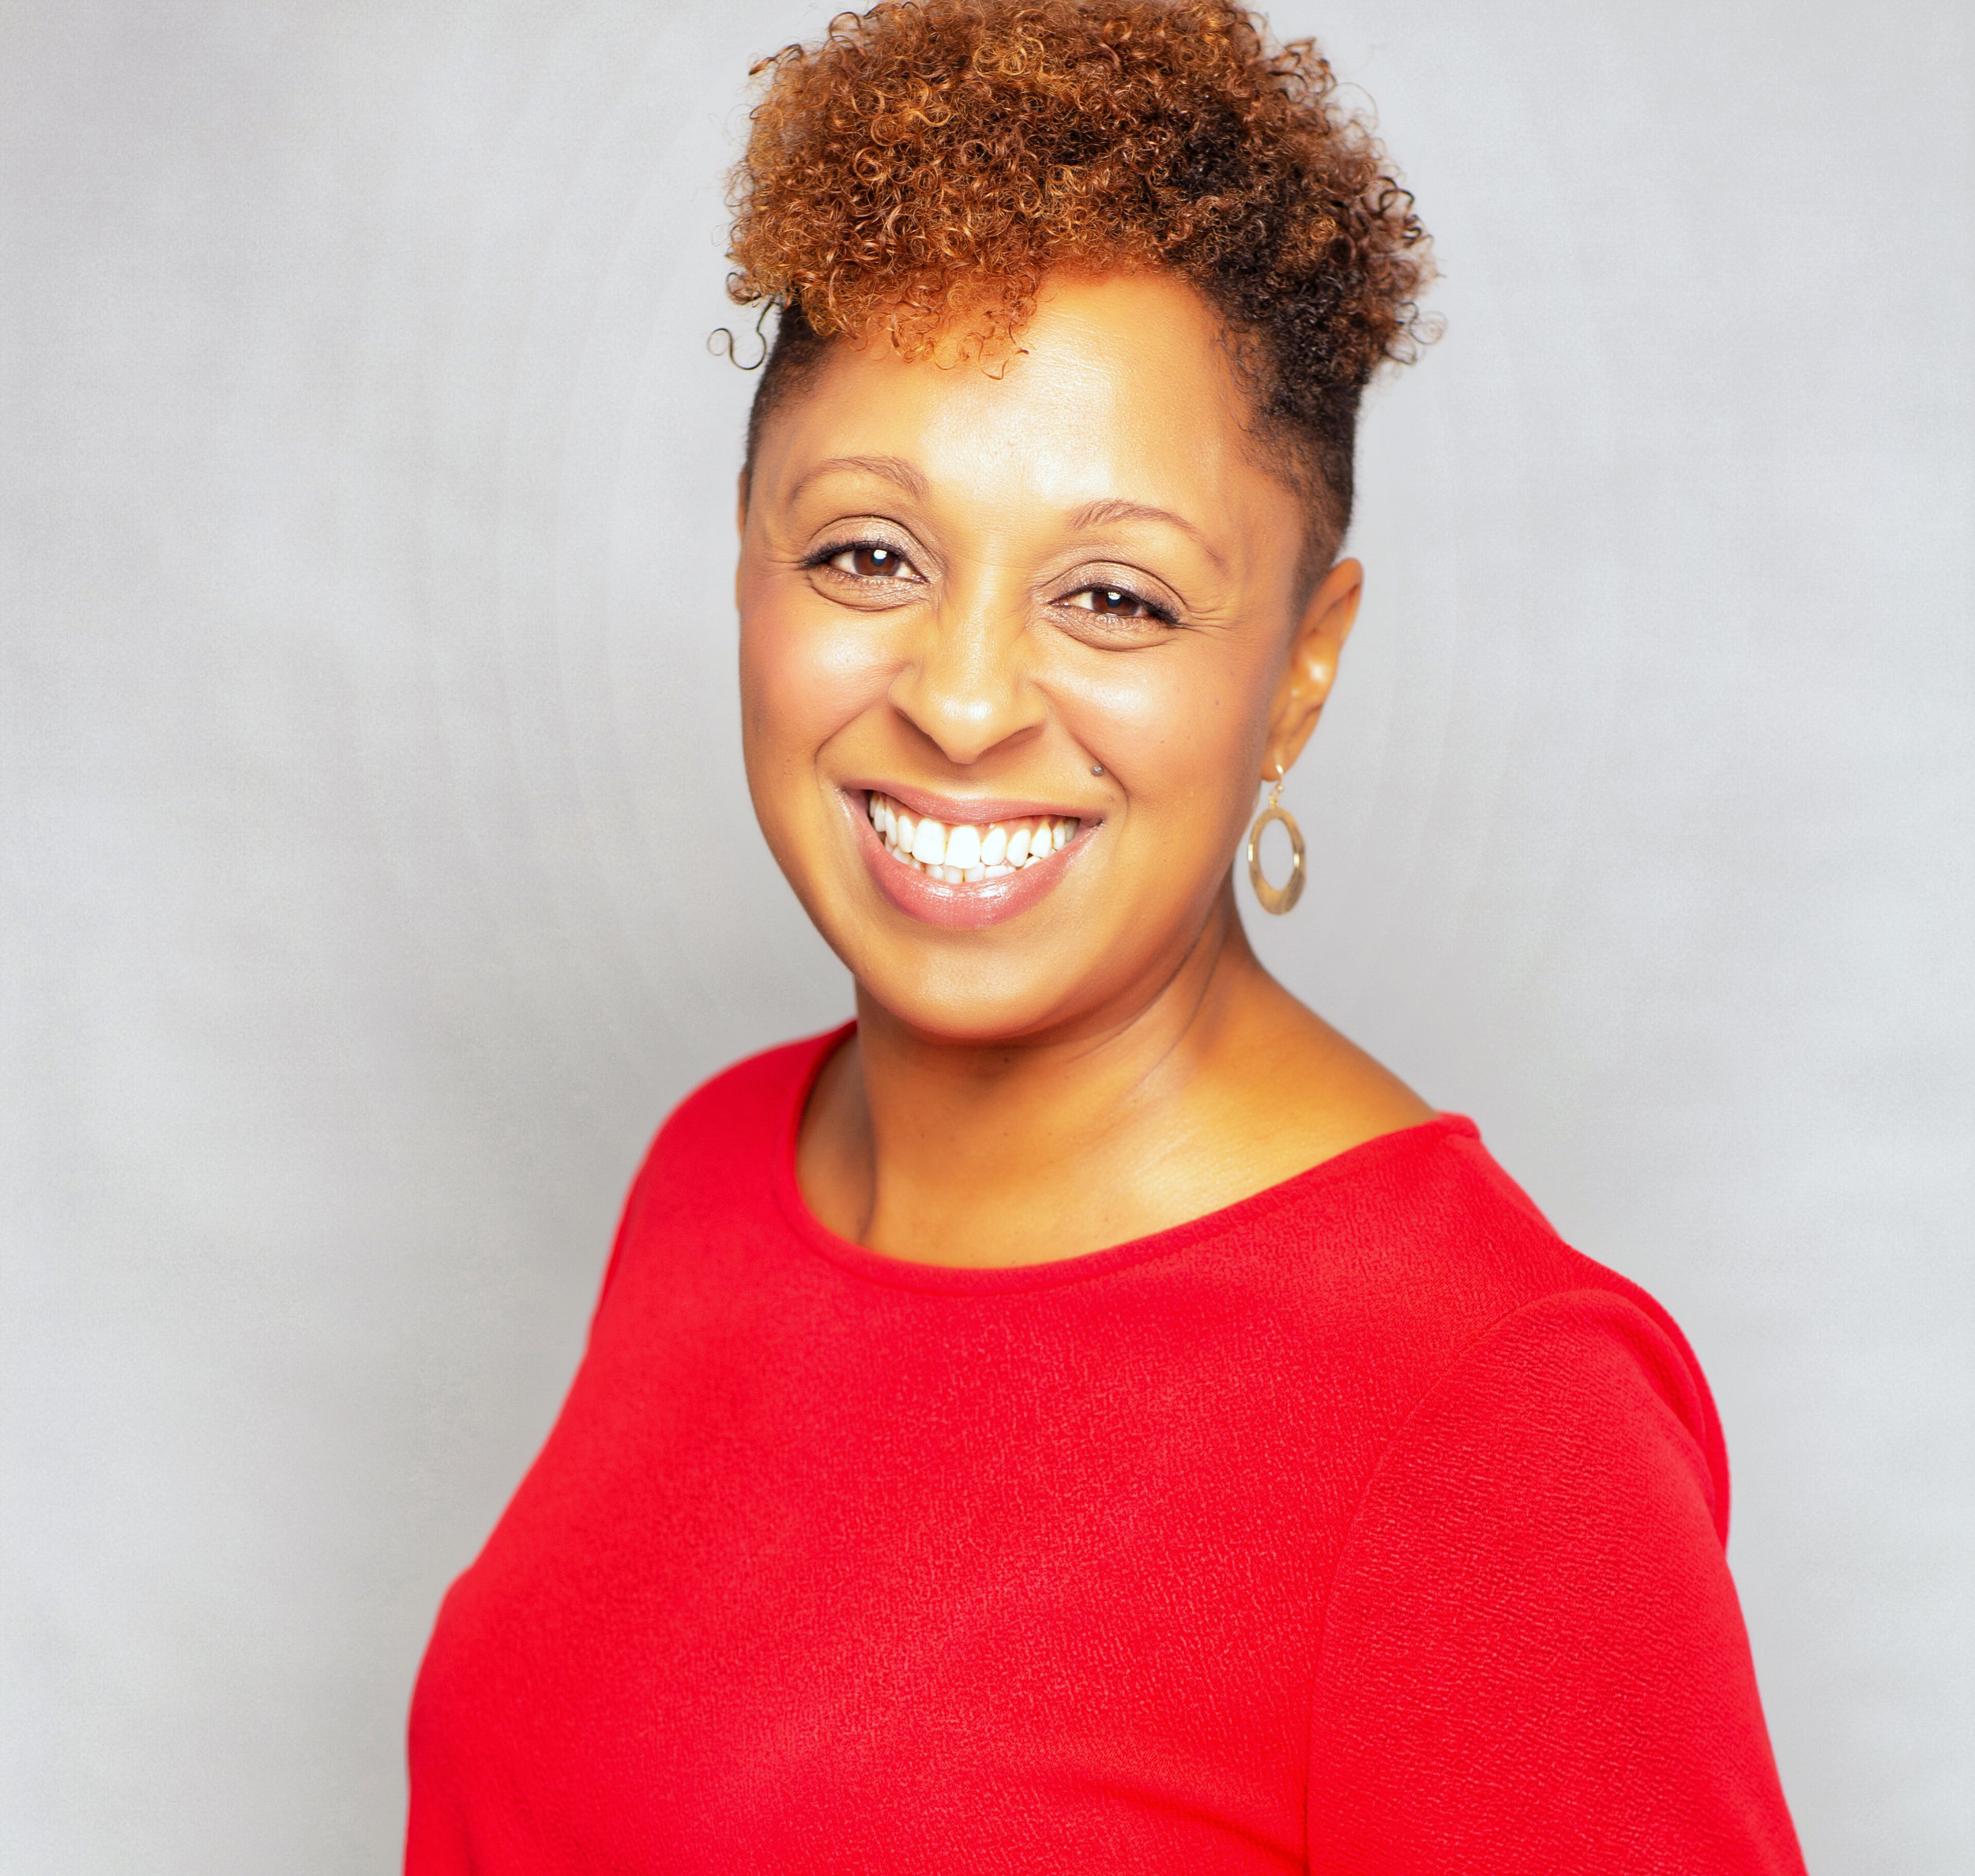 Jersey Garcia  Psychotherapist  Coach for women contemplating divorce  Divorced Girls Date Podcast and Community   http://jerseygarcia.com